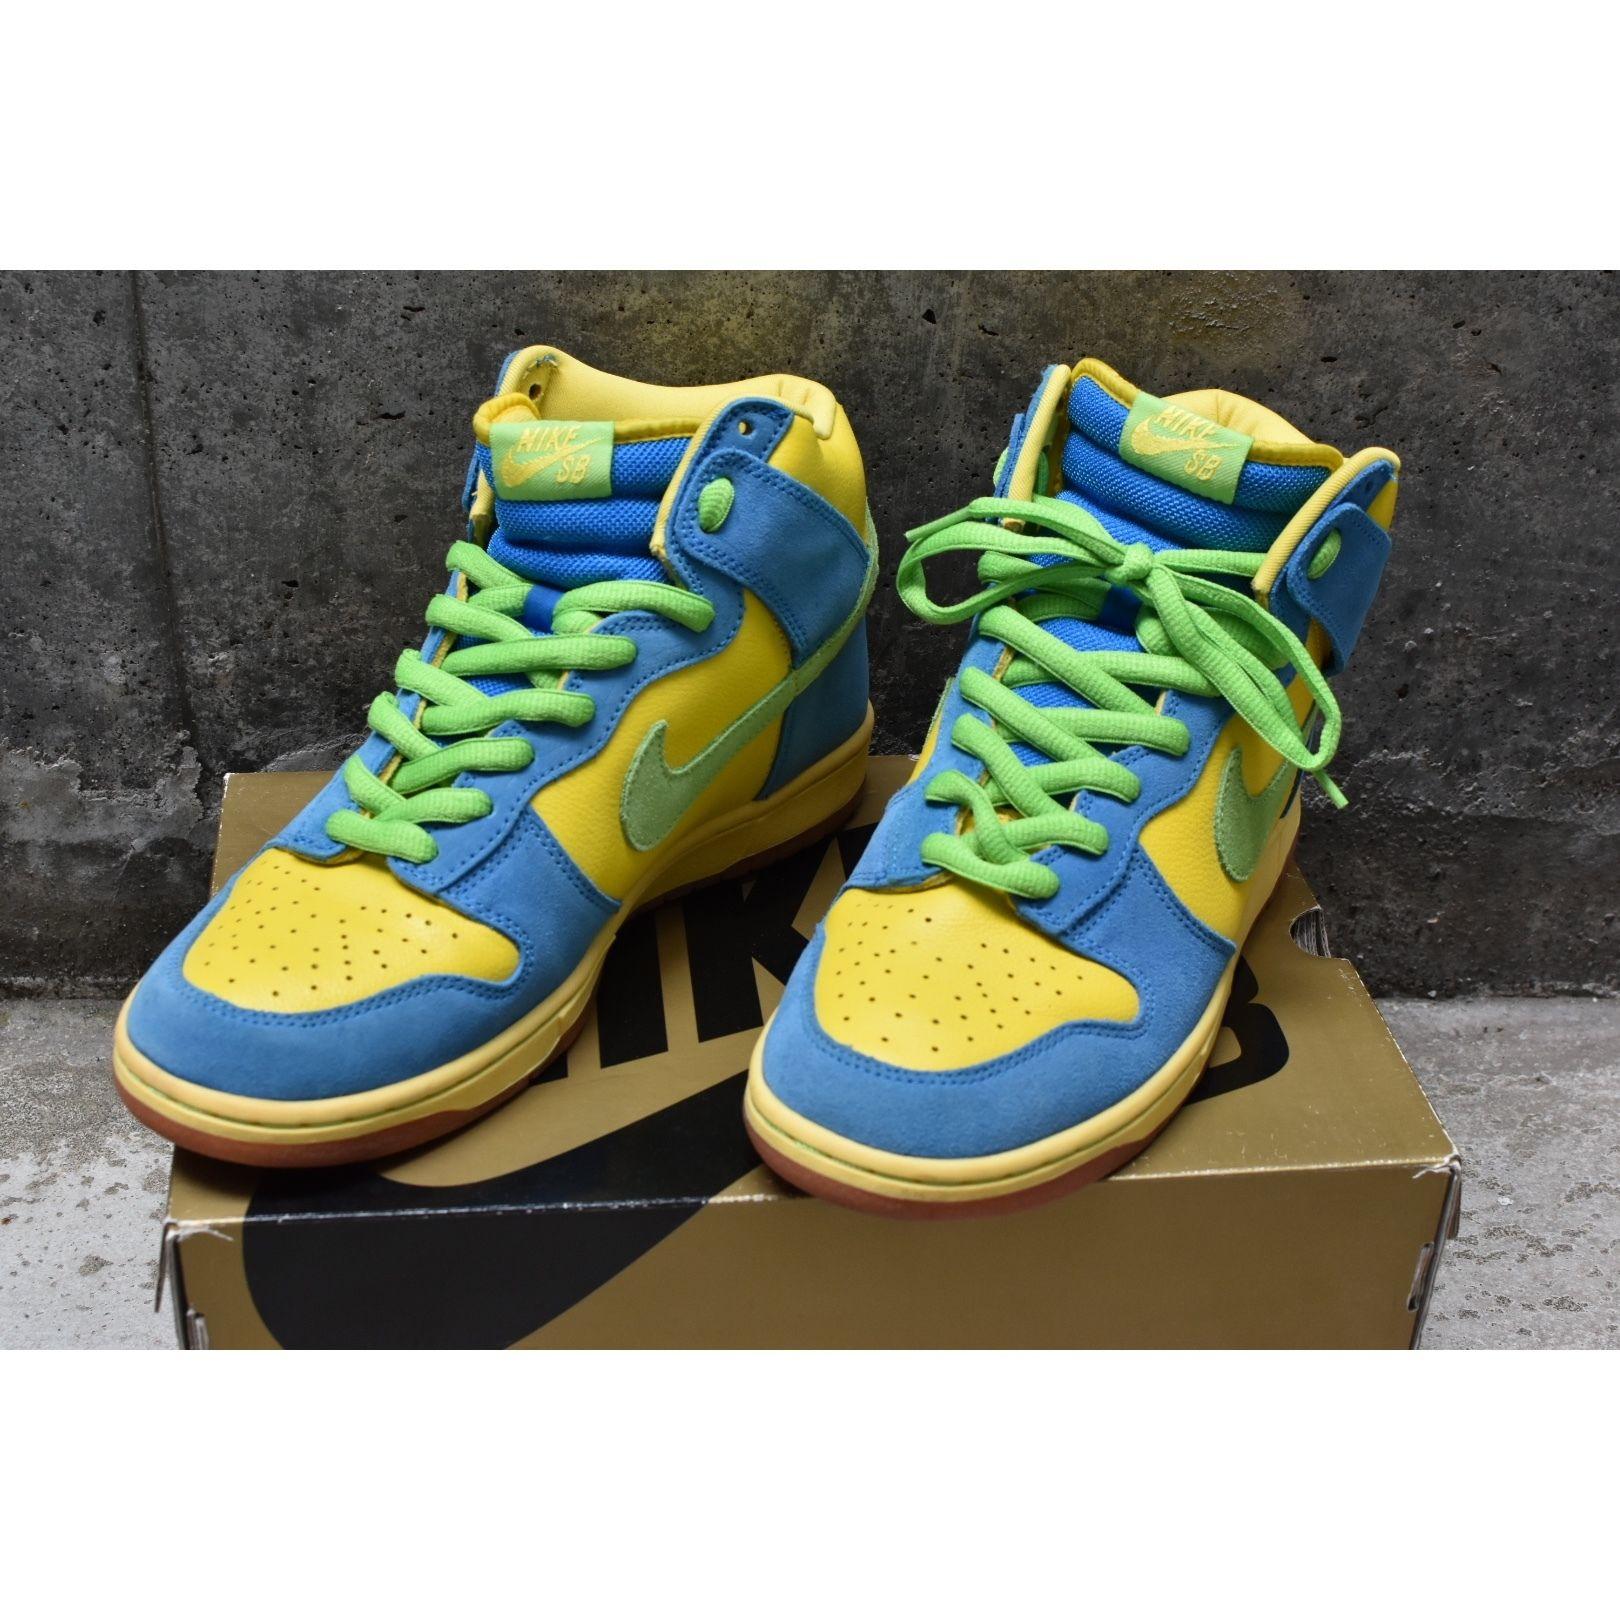 【Nike sb】DUNK HIGH PRO SB 「マージ・シンプソン」